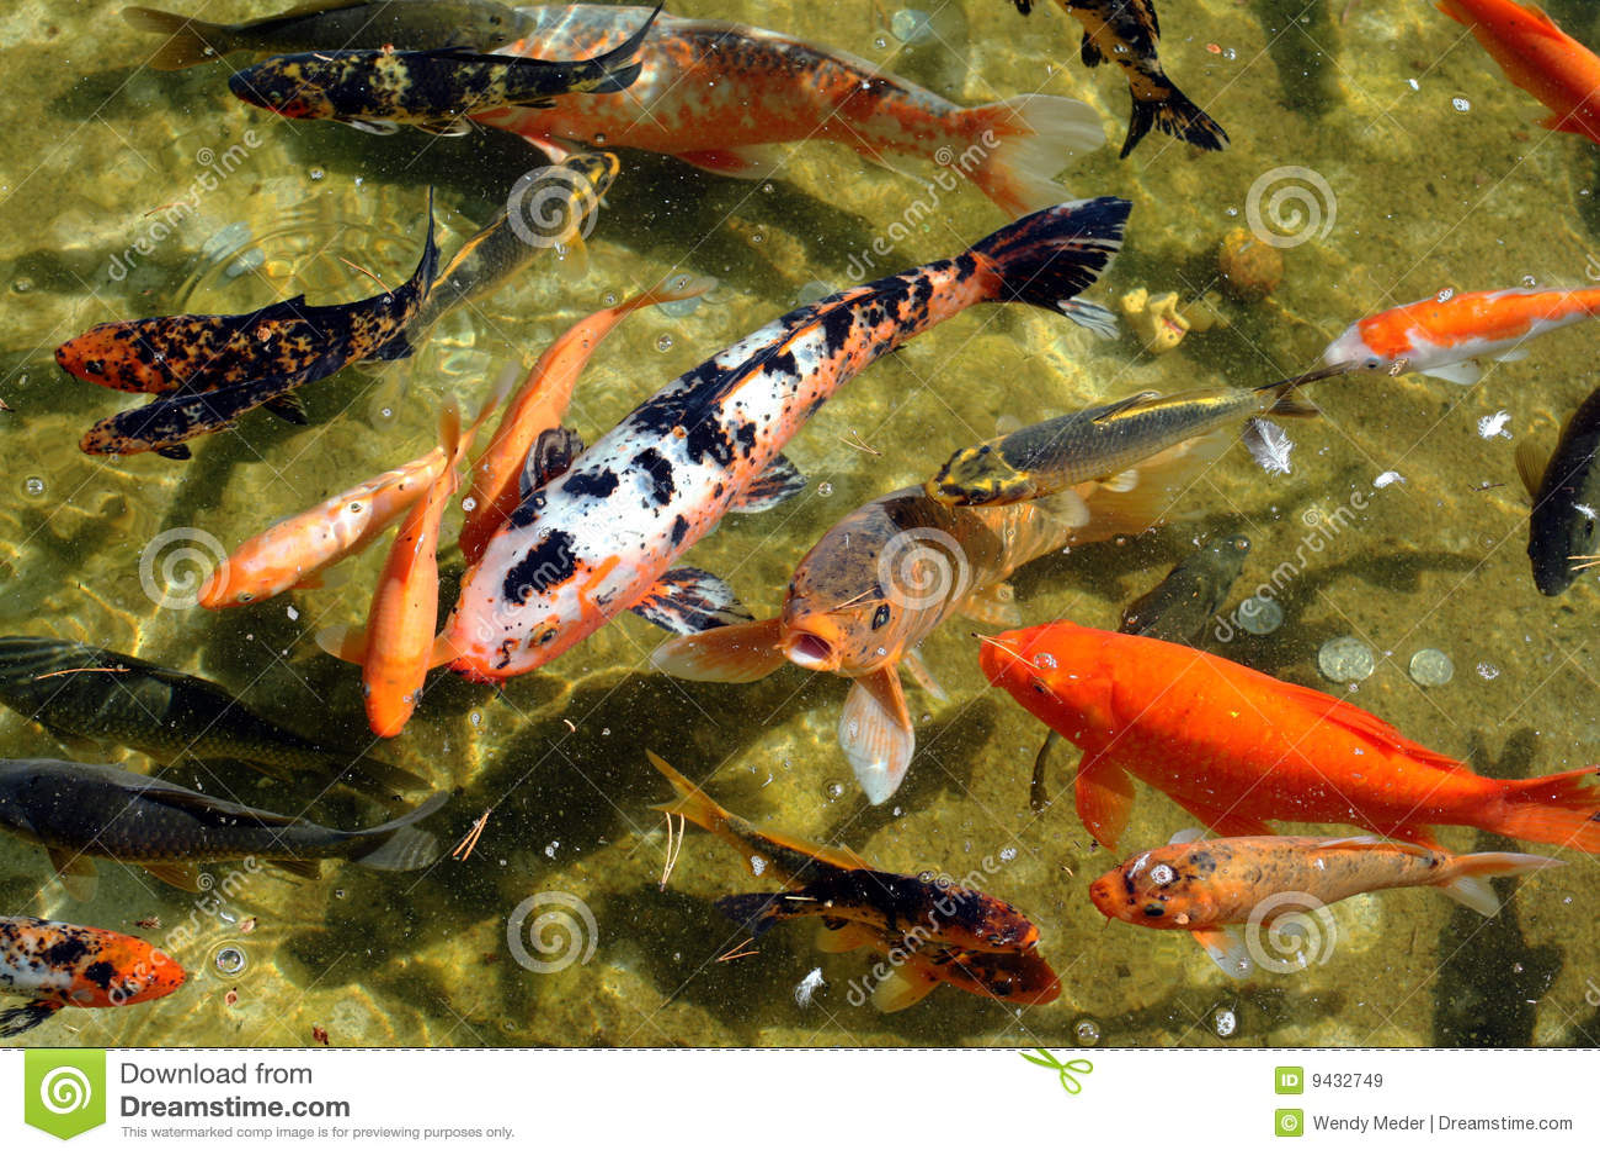 Japanese koi fish royalty free stock images image 9432749 for Japanese pond fish